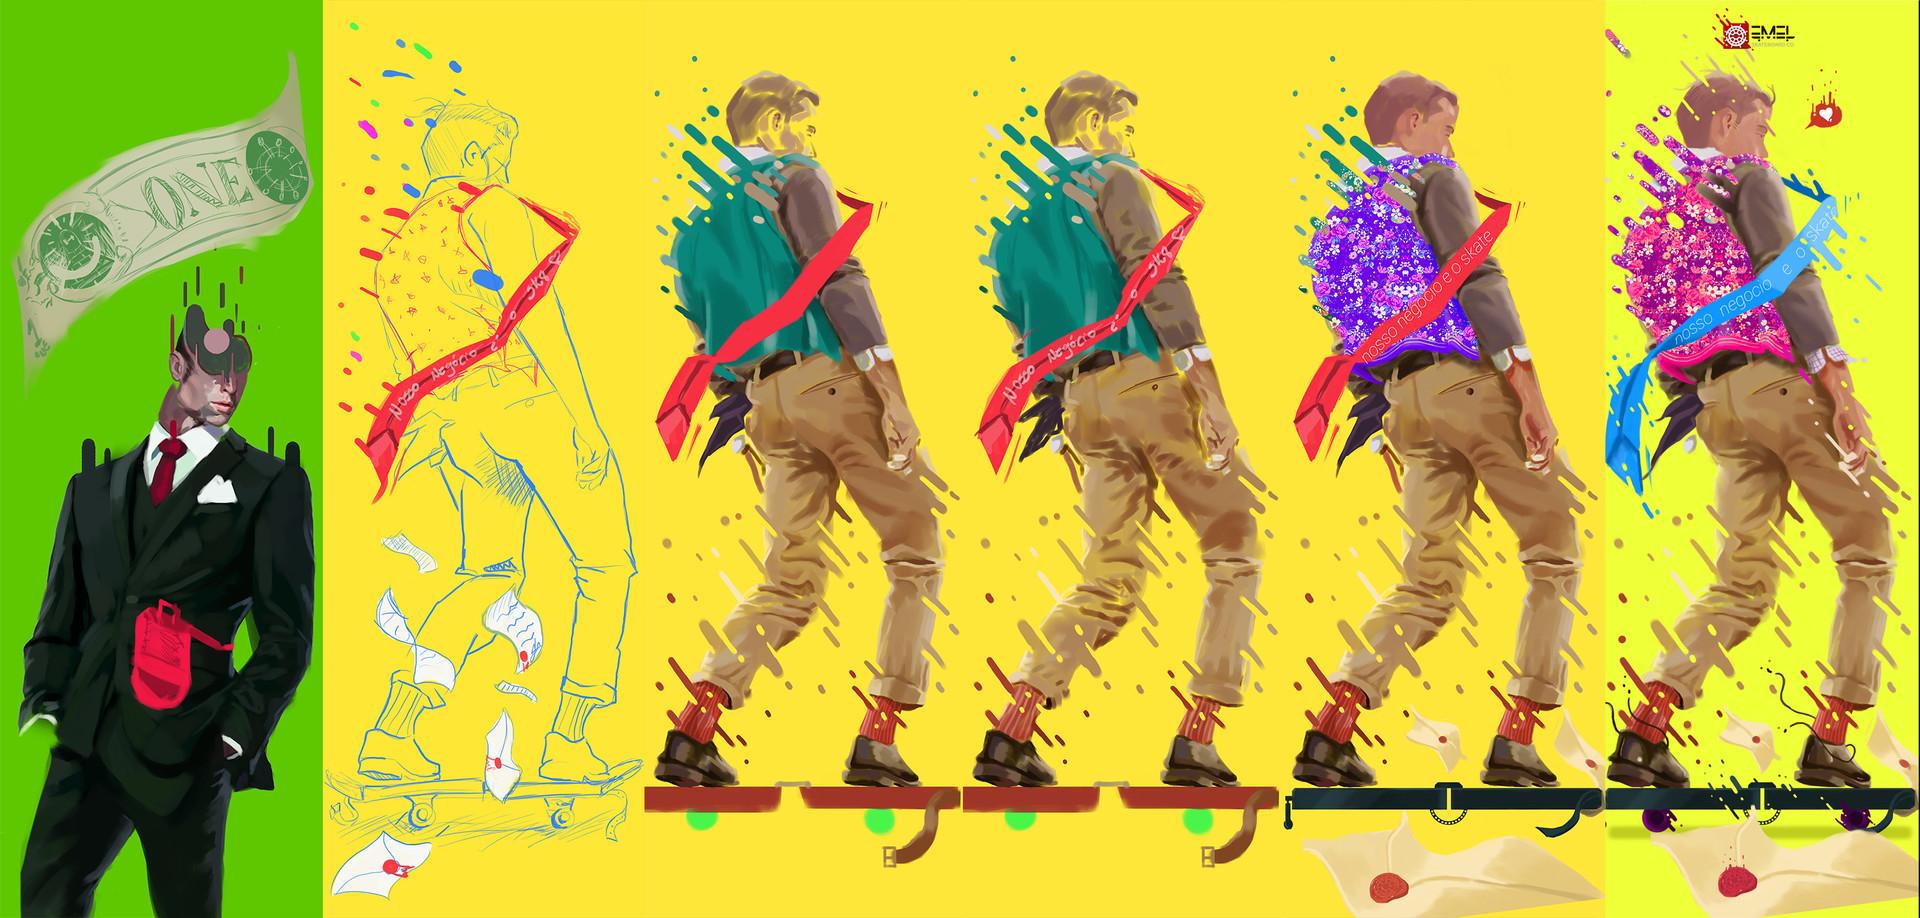 Marcos mansur our bussines is skate process